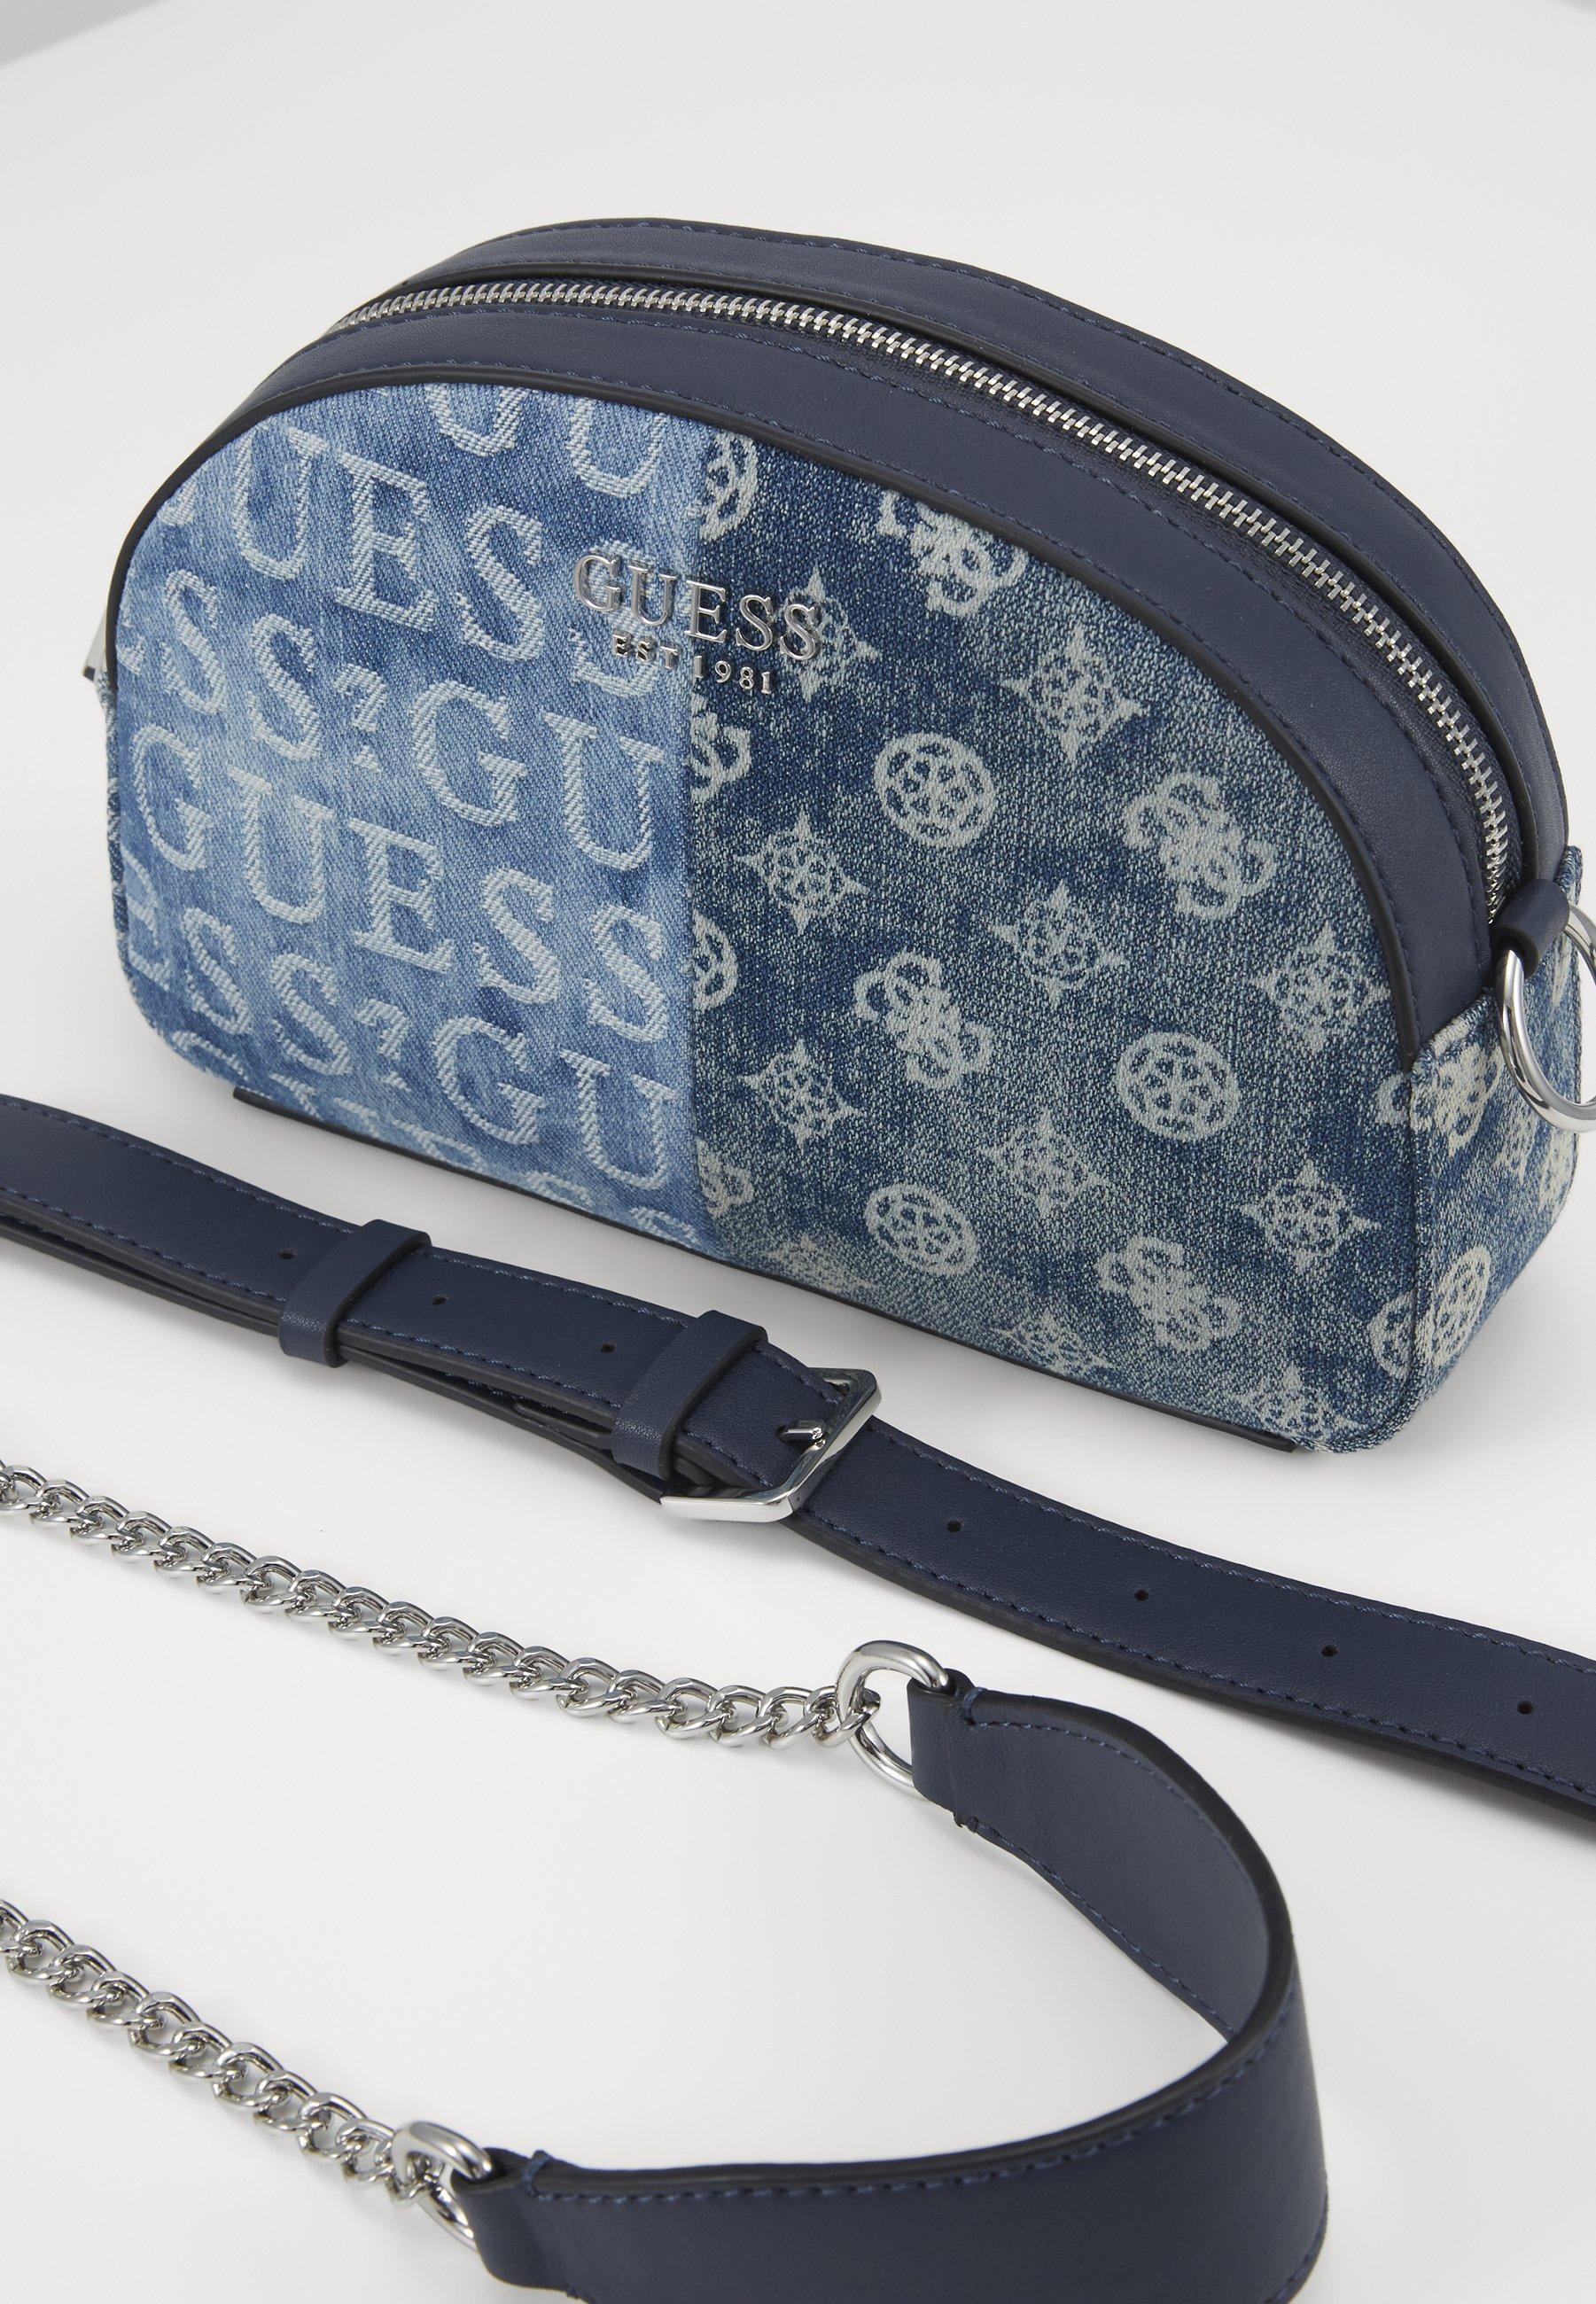 Guess Kaylyn Mini Crossbody Top Zip - Umhängetasche Denim/blau